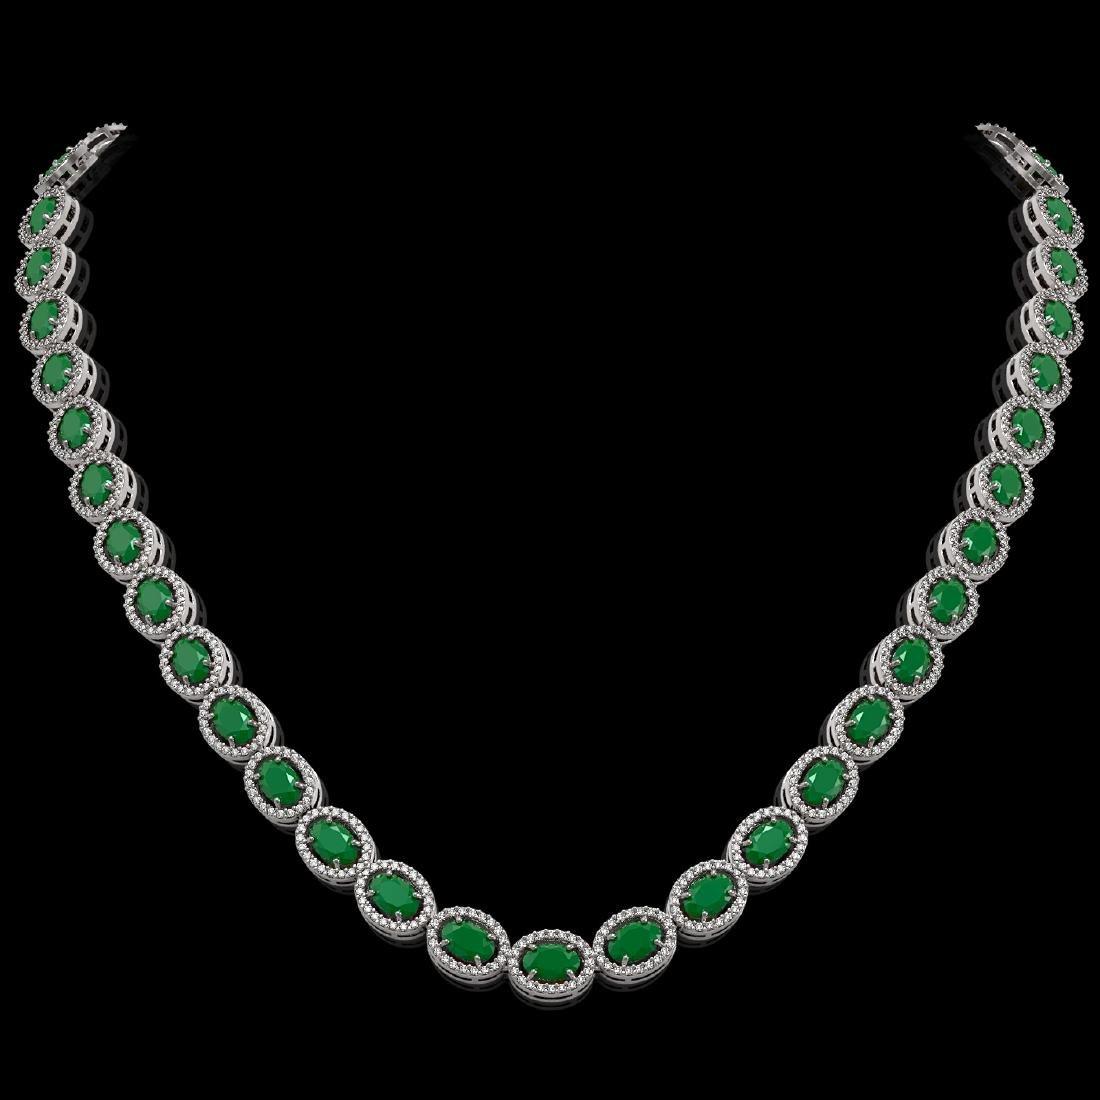 34.11 CTW Emerald & Diamond Halo Necklace 10K White